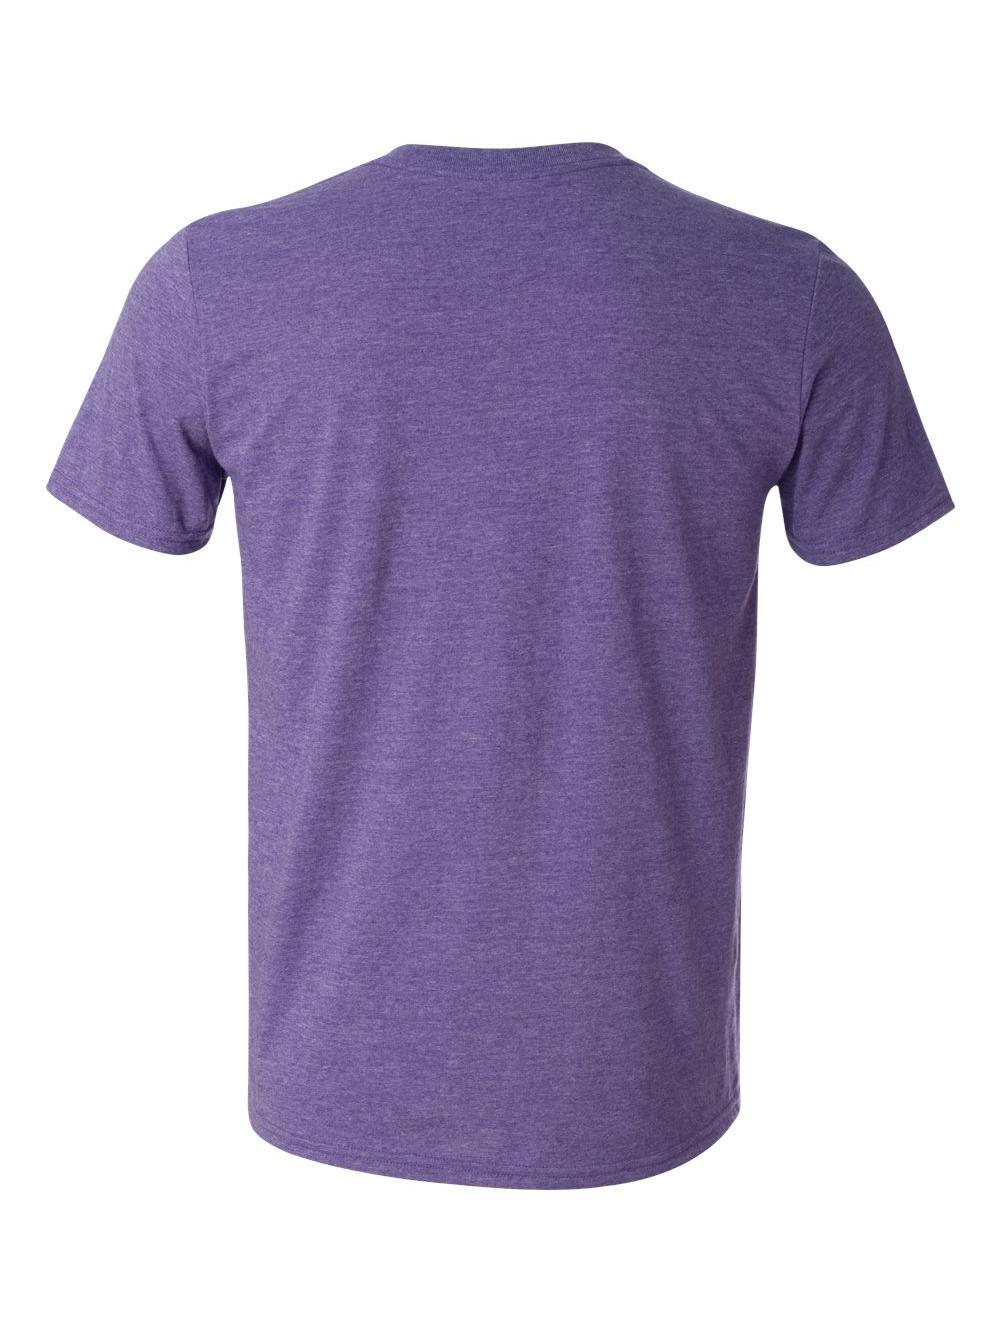 Gildan-Softstyle-T-Shirt-64000 thumbnail 91